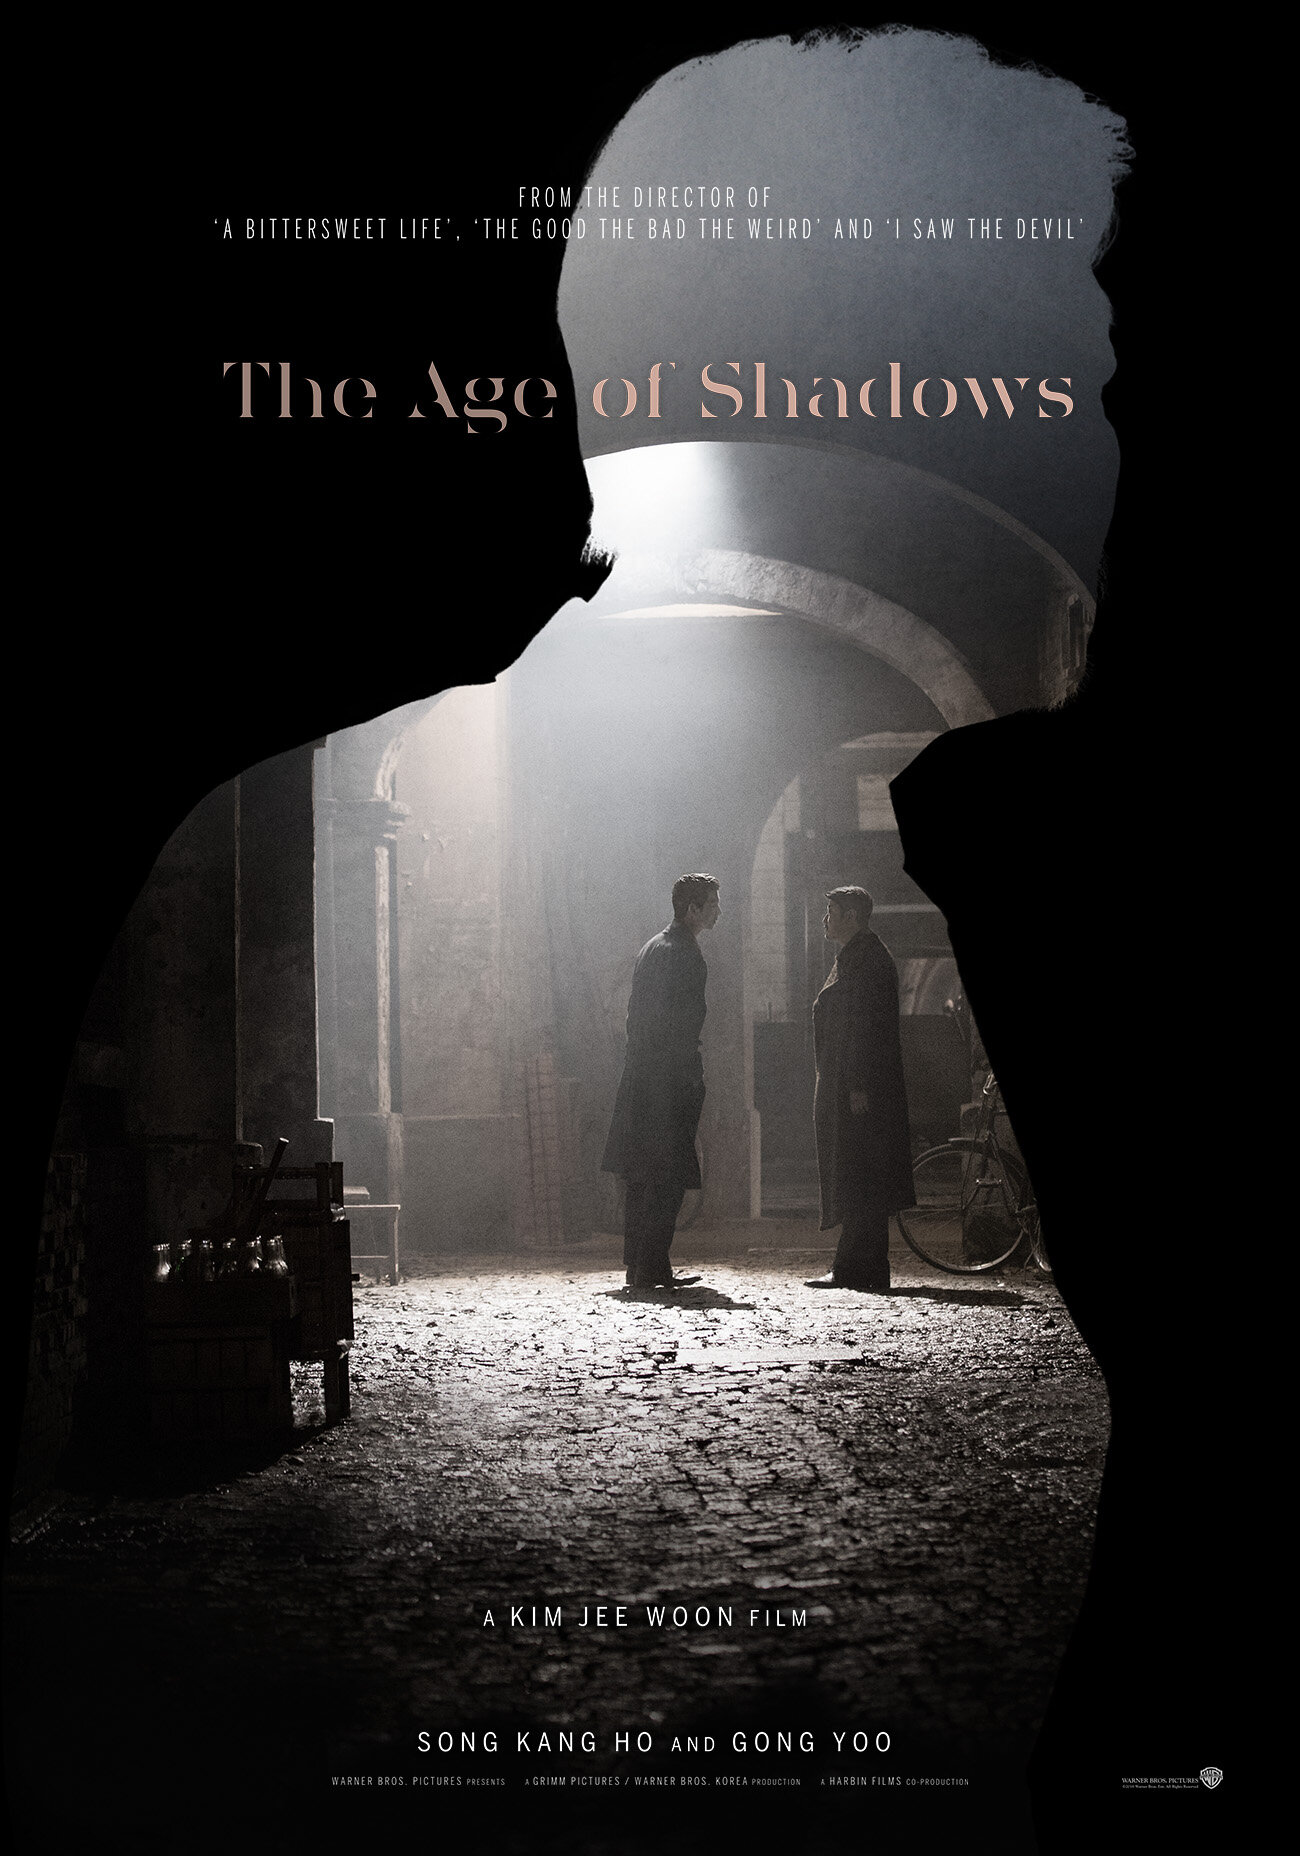 TheAgeOfShadows.jpg